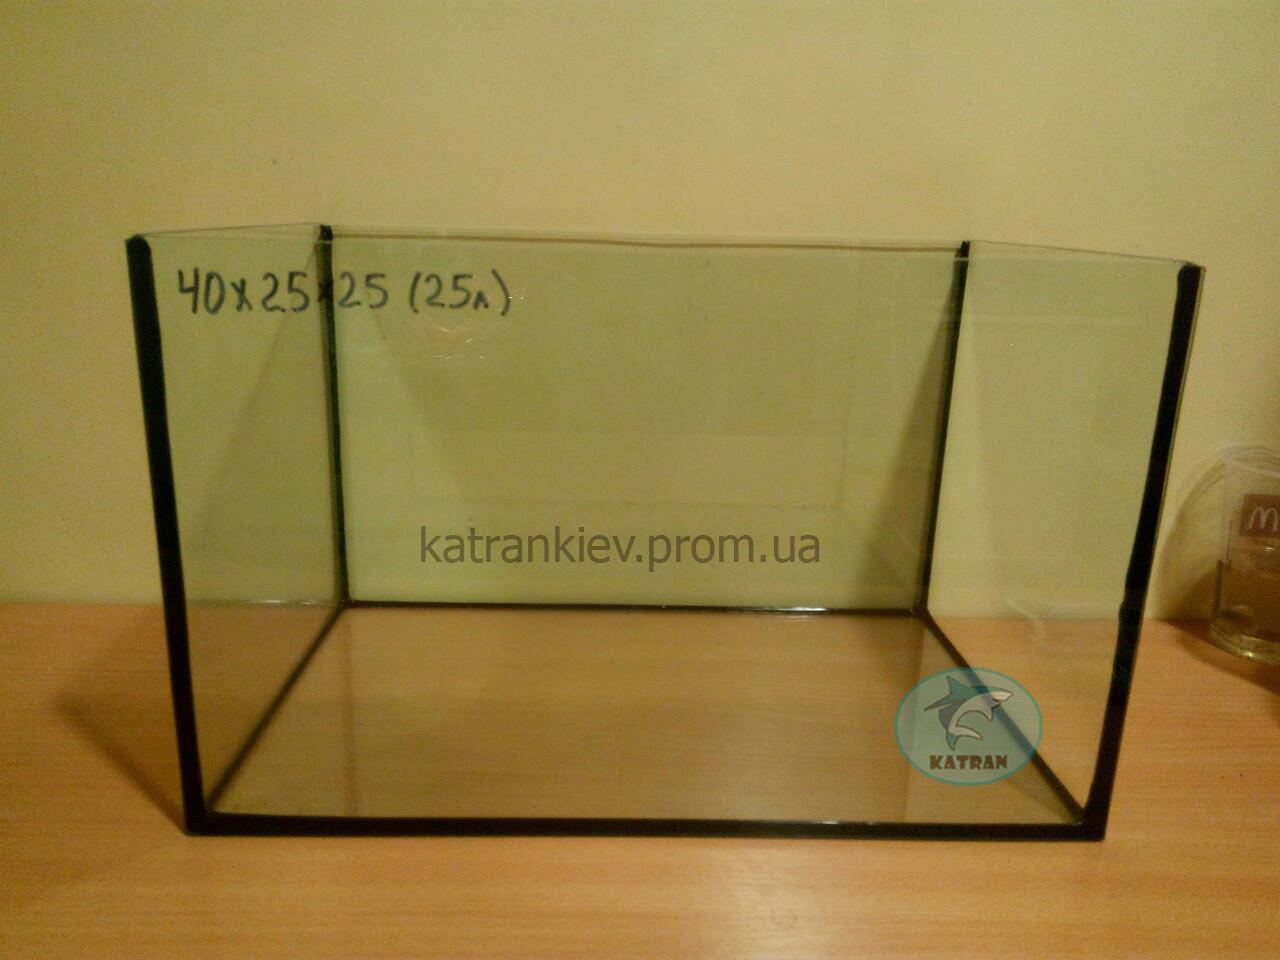 Аквариум 40*25*25 (25 л) 4мм